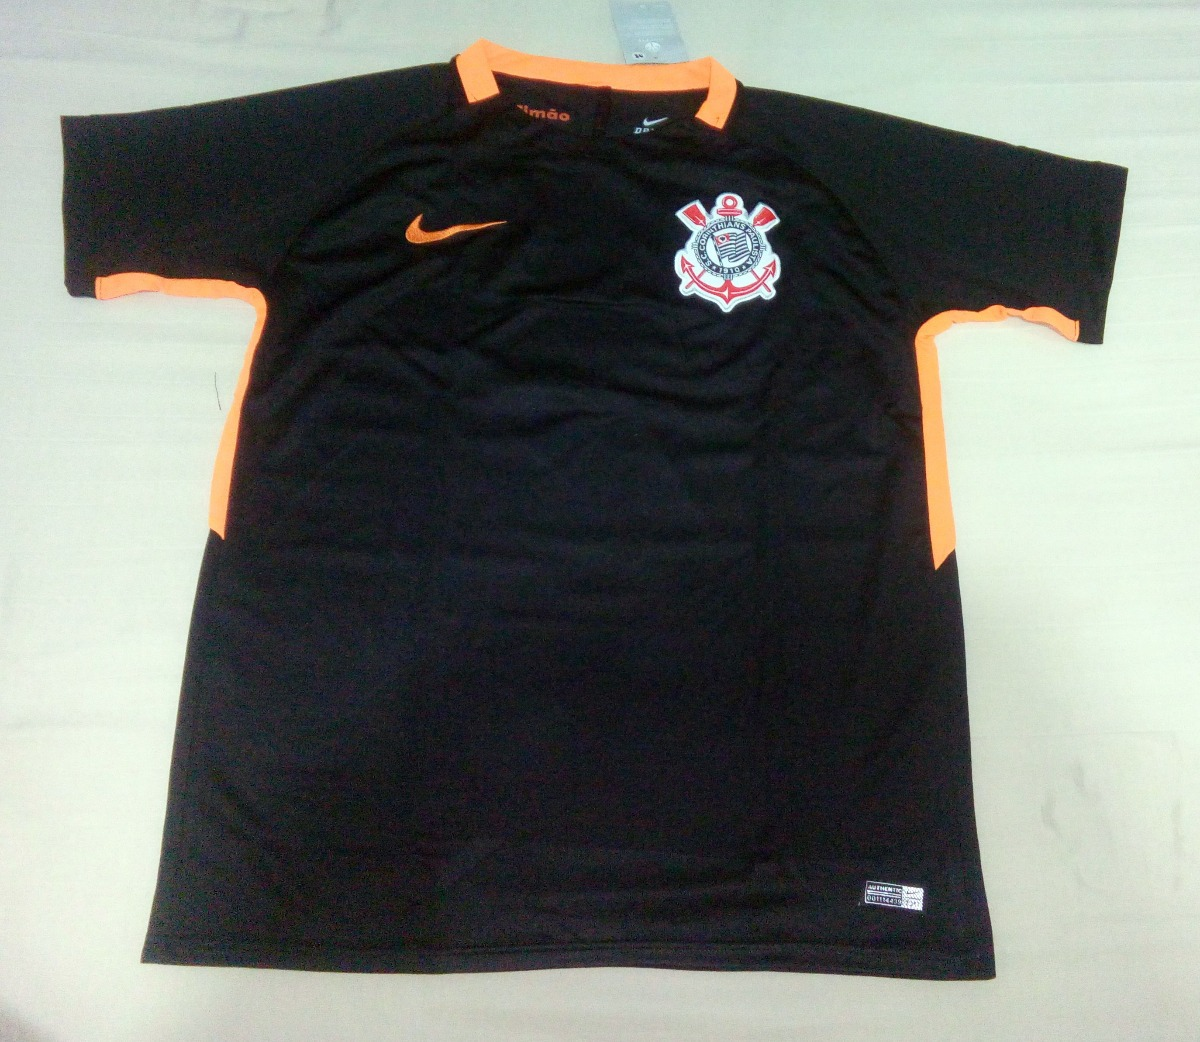 a0dfafc545 camisa corinthians 17 -18 preto / laranja supporter torcedor. Carregando  zoom.